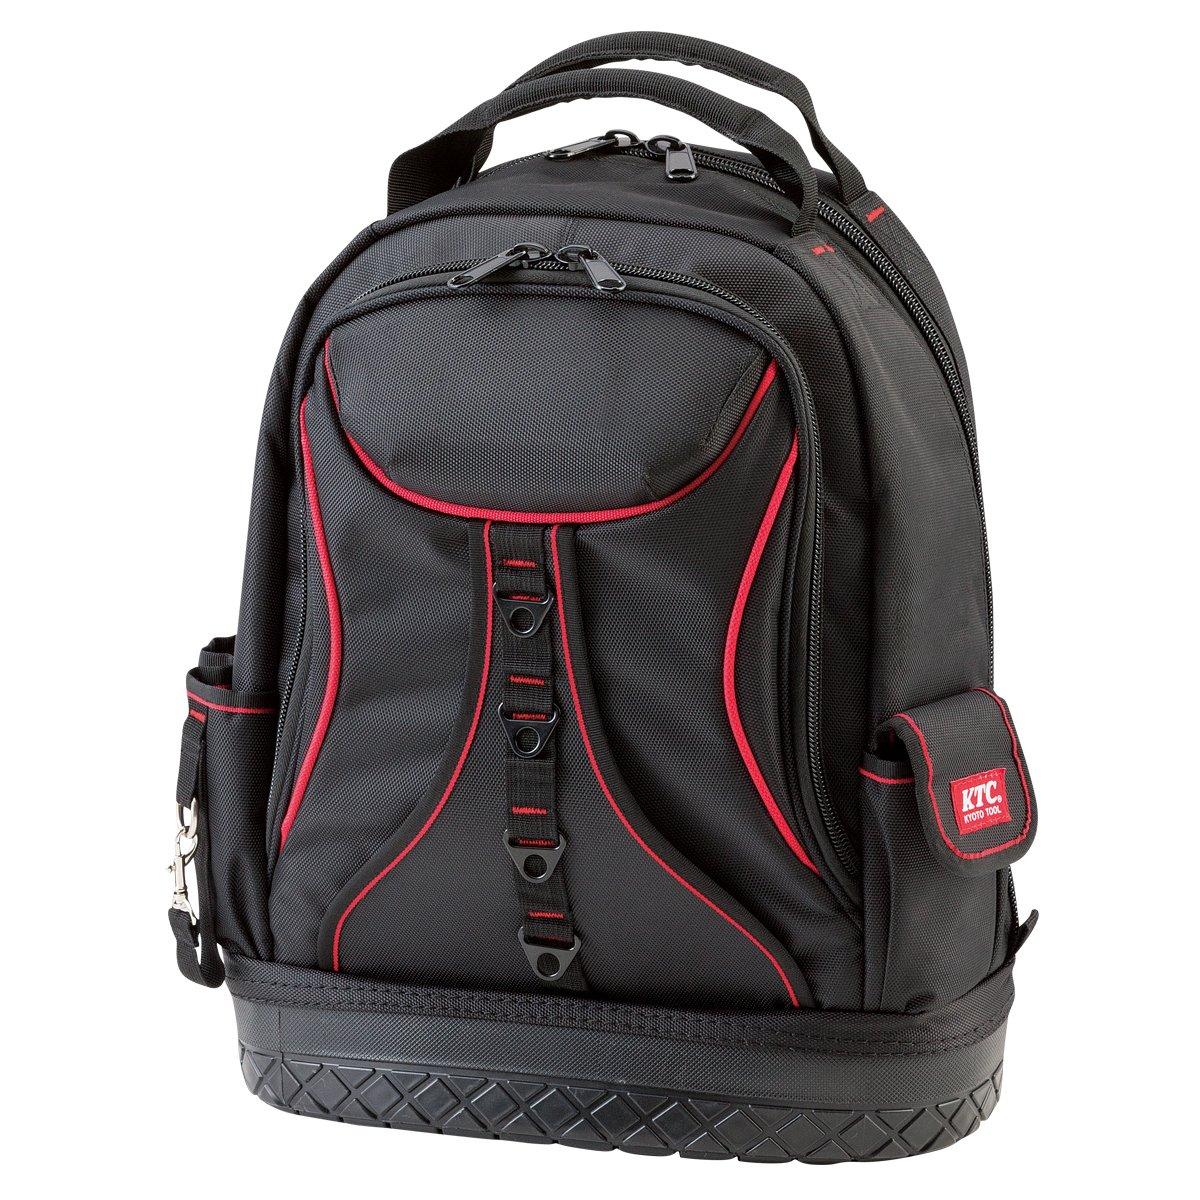 KTC(ケーテーシー) アクティブバディシリーズ バッグパックタイプ (バッグのみ) EKL-130 (SK SALE 2018)